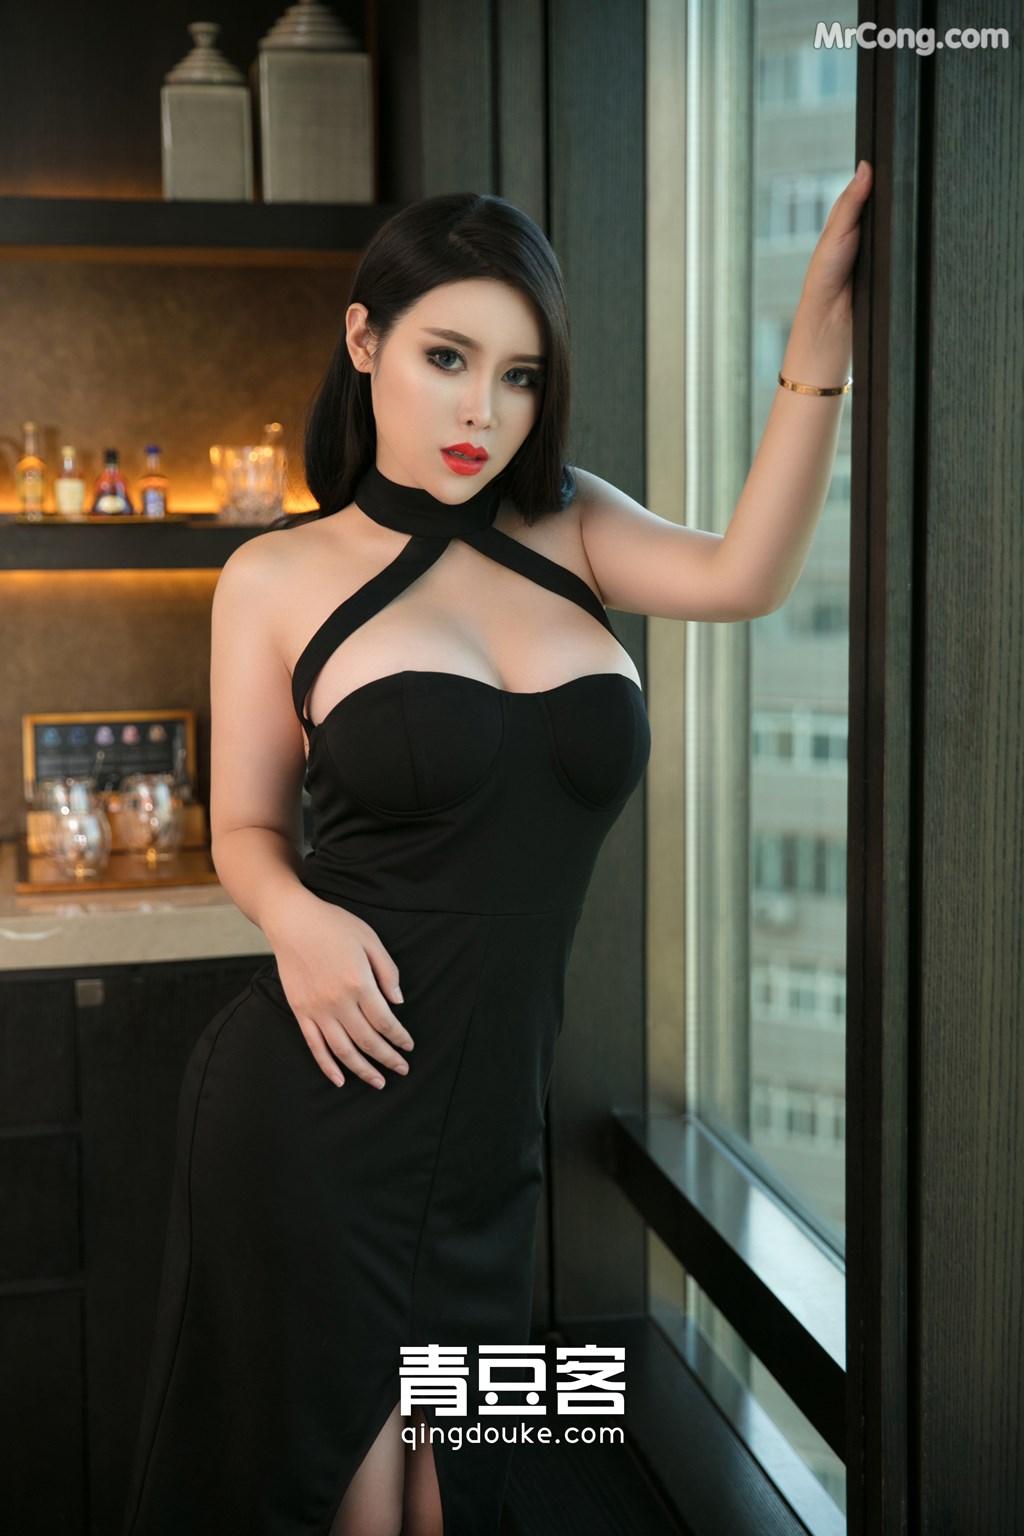 Image QingDouKe-2017-11-05-Ke-Rui-Na-MrCong.com-008 in post QingDouKe 2017-11-05: Người mẫu Ke Rui Na (可蕊娜) (48 ảnh)